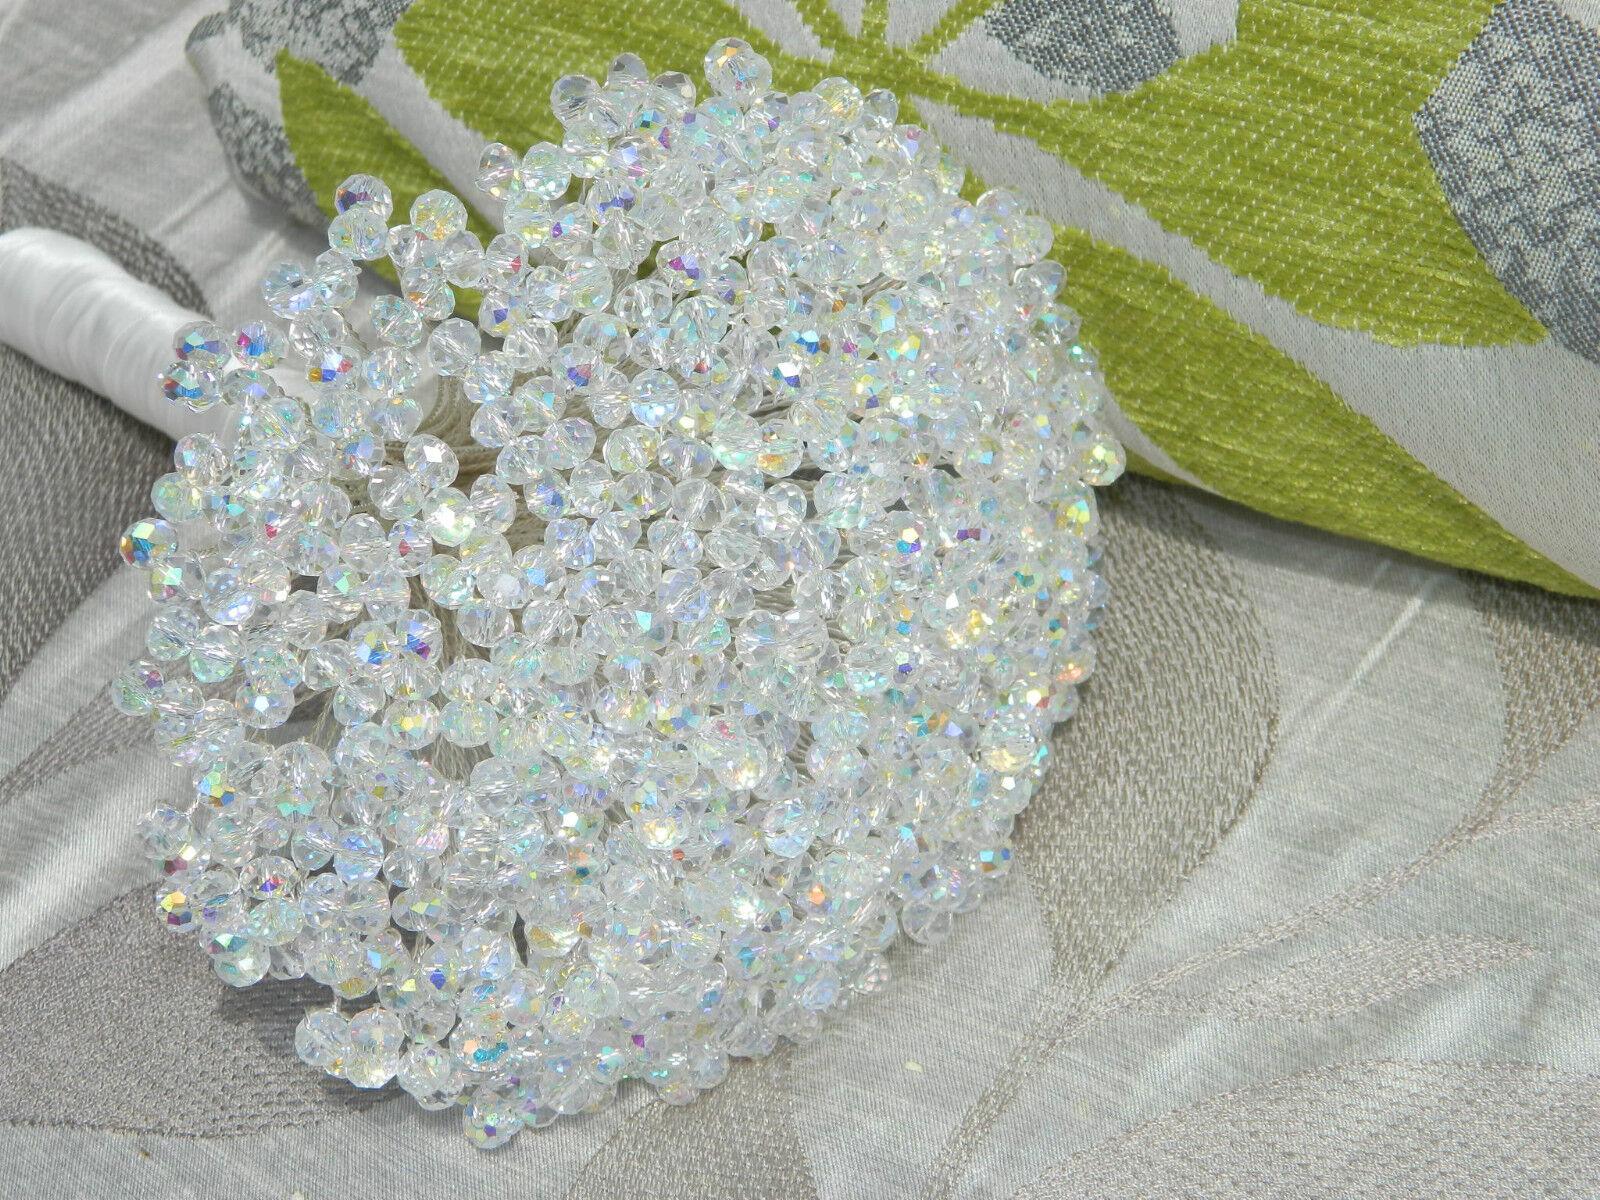 Crystal  'Elegance' mariage brides crystal Bouquet  5